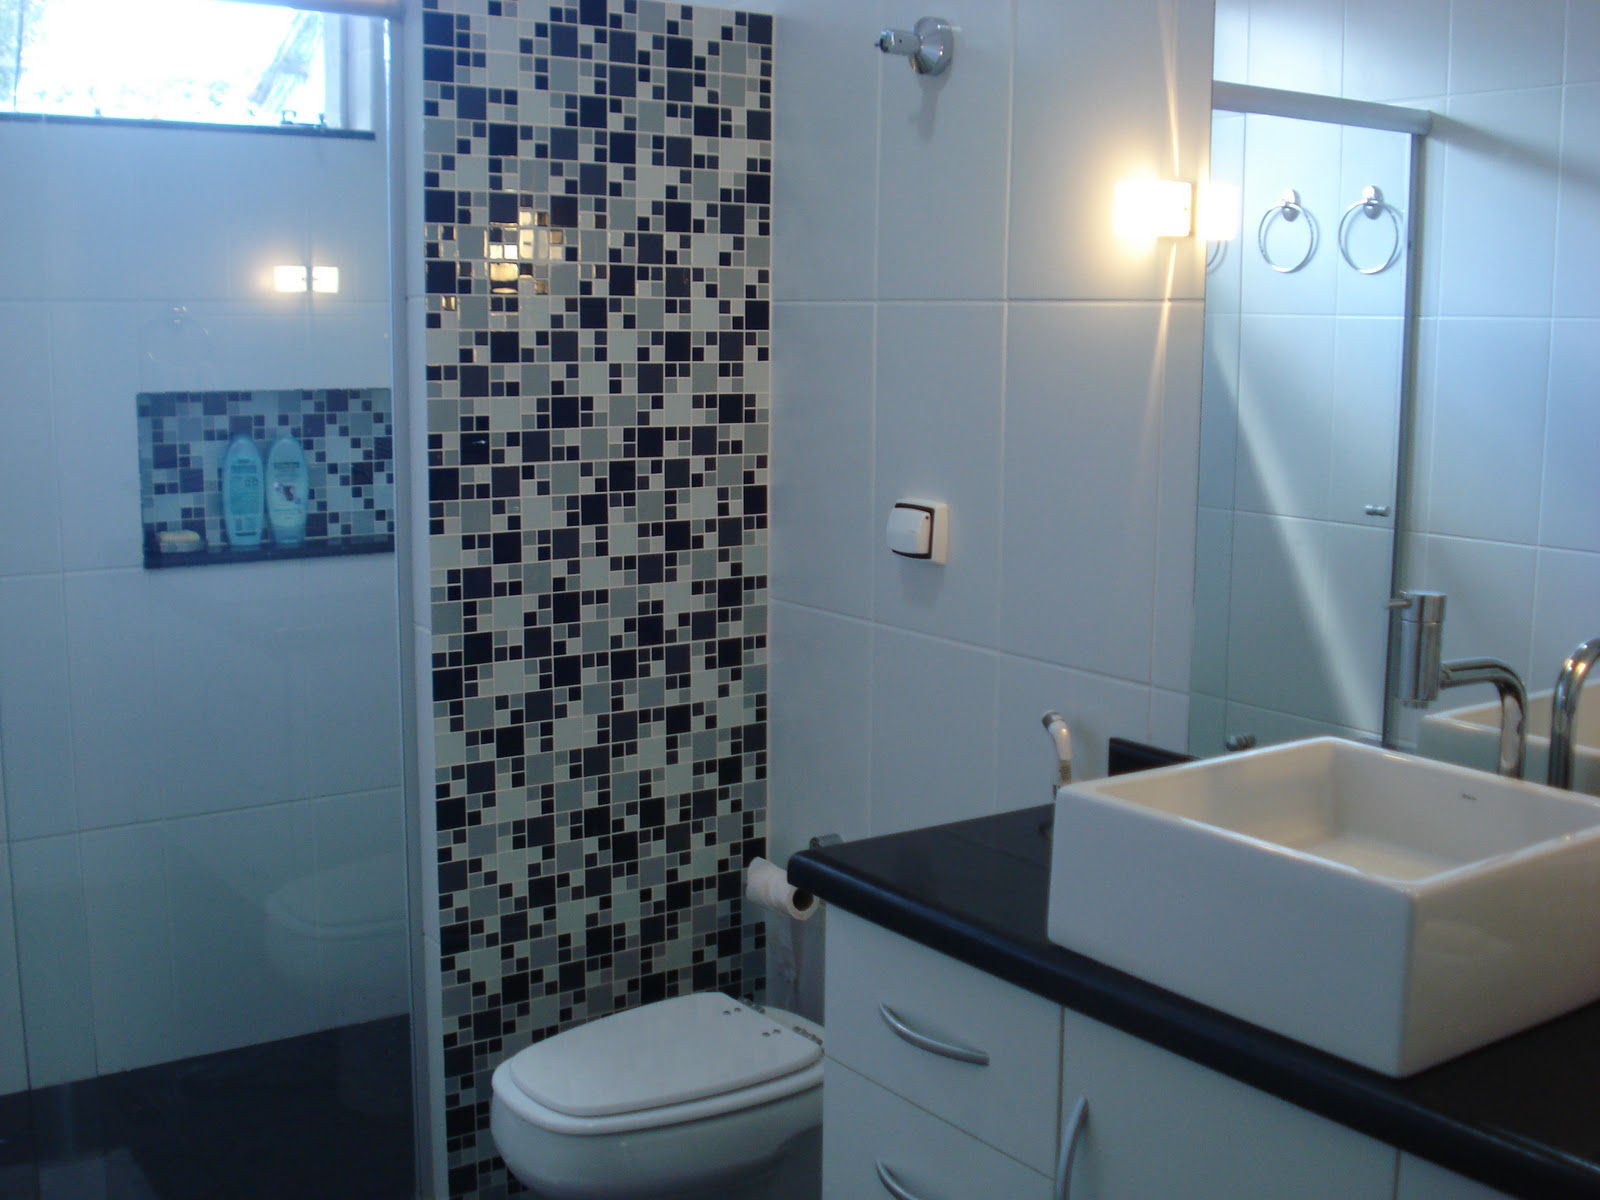 decoracao banheiro pastilhas : decoracao banheiro pastilhas:BANHEIRO – PASTILHAS DE VIDRO: vamos brincar de decorar! -